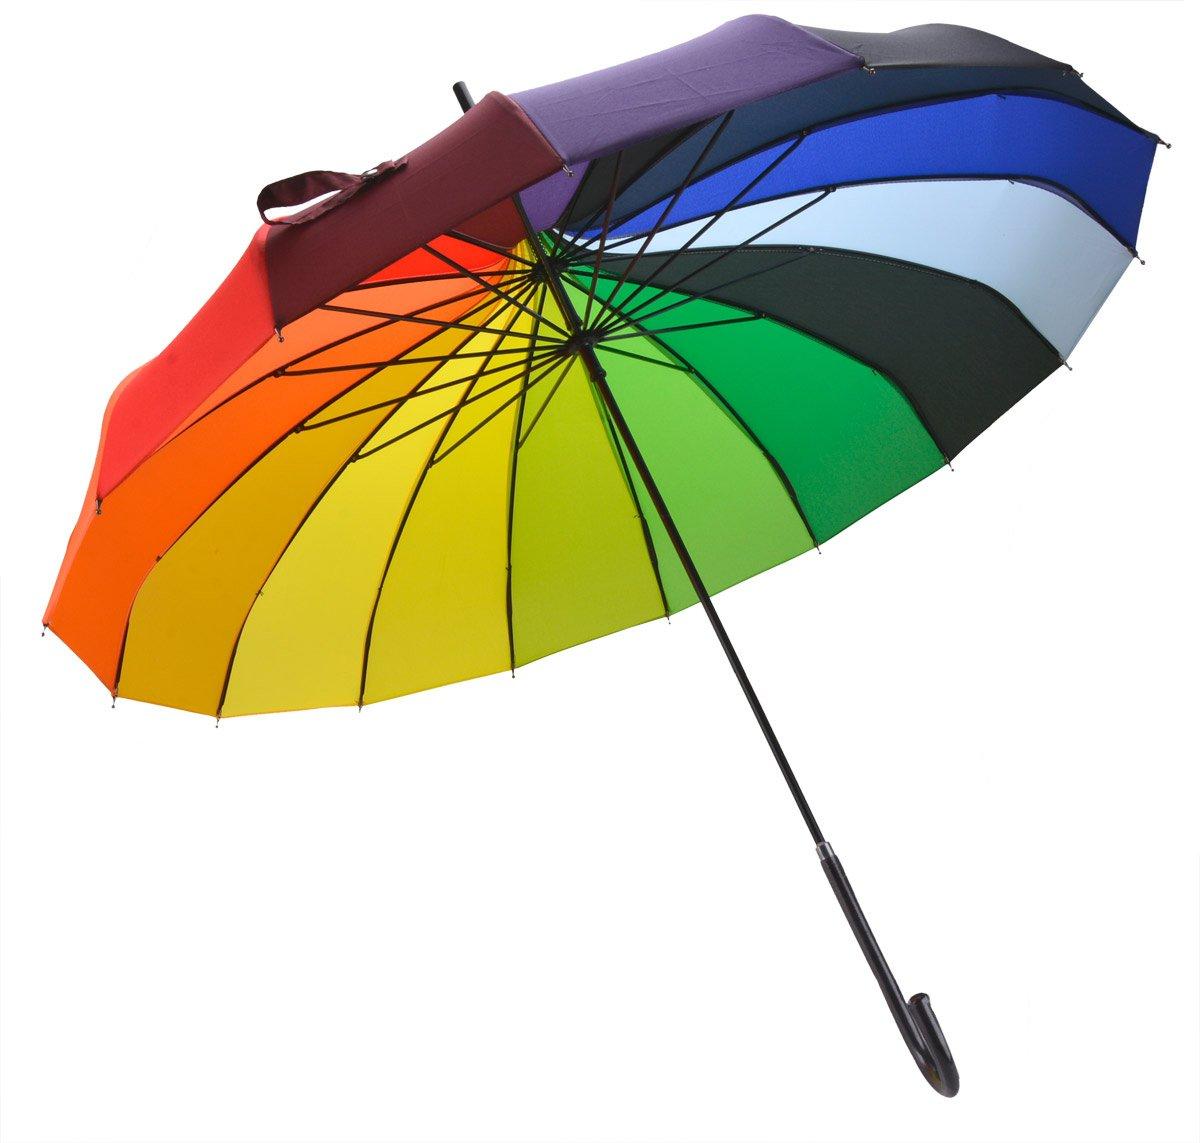 OUTGEEK Rainbow Umbrella Pagoda Long Handle Vintage Windproof Umbrella Parasol 2